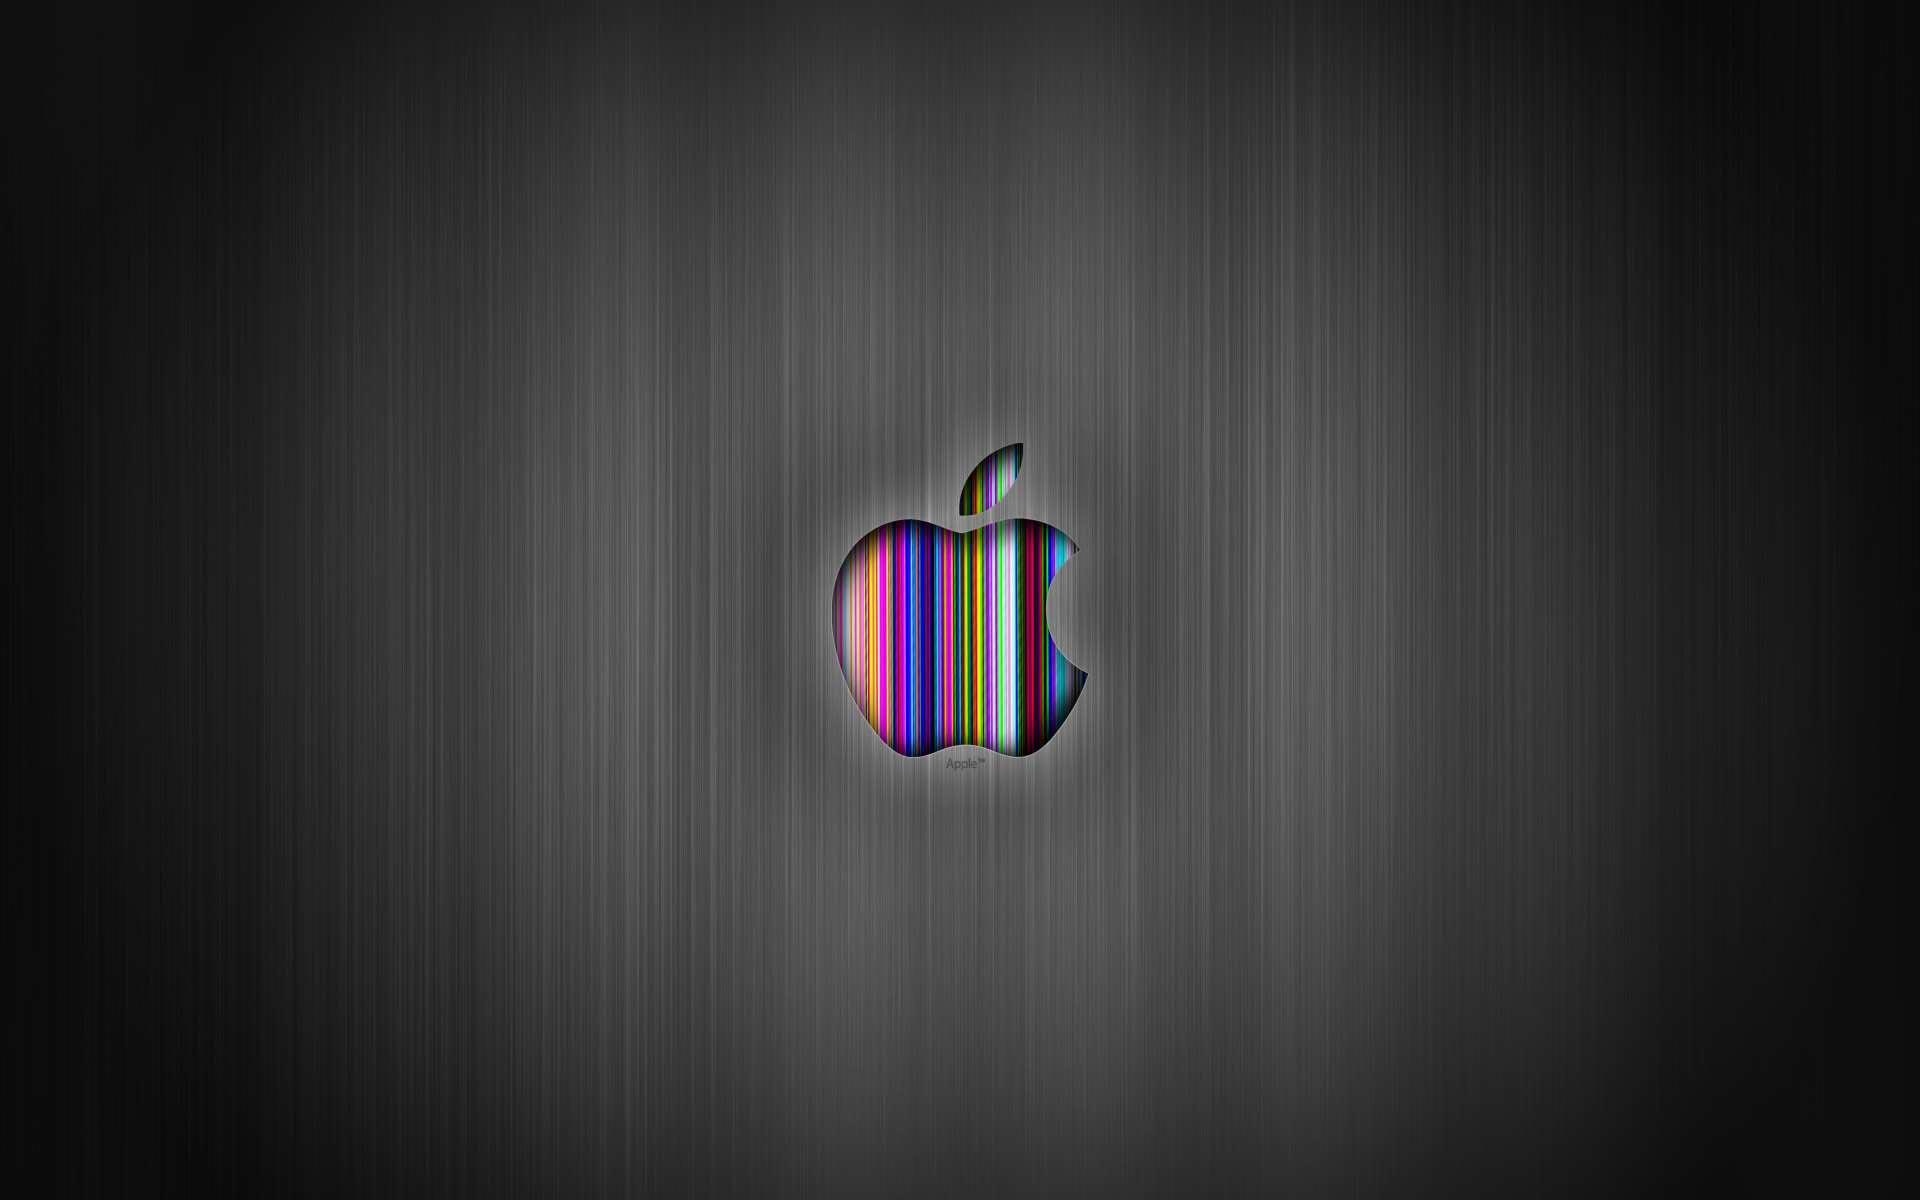 Collection of Apple Desktop Wallpaper Hd on HDWallpapers